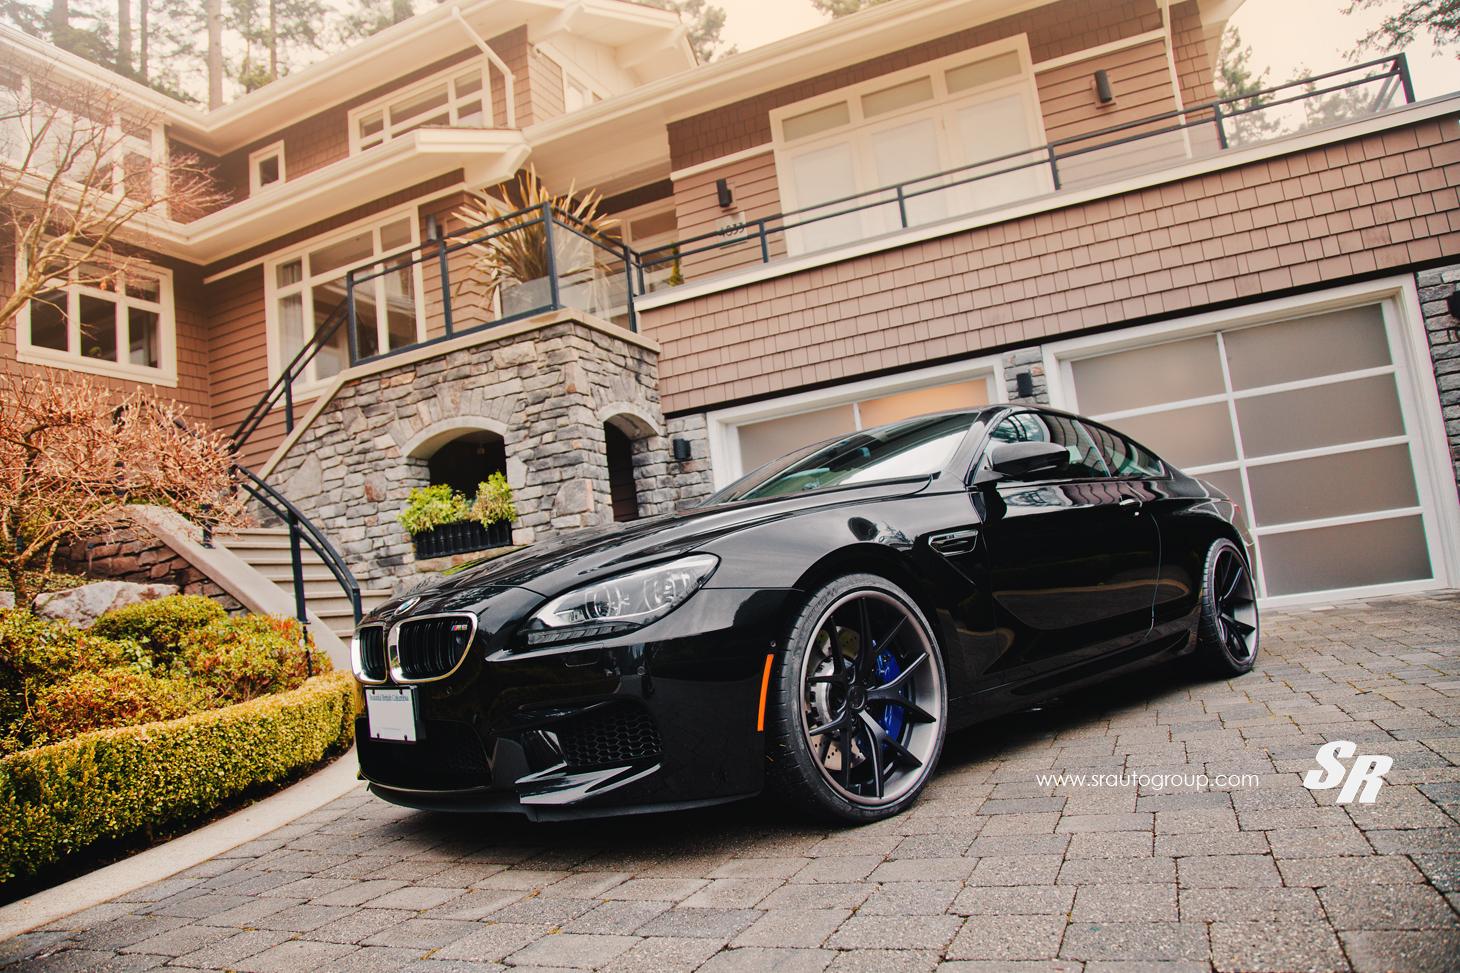 2013 F12 Bmw M6 On Pur Wheels Autoevolution